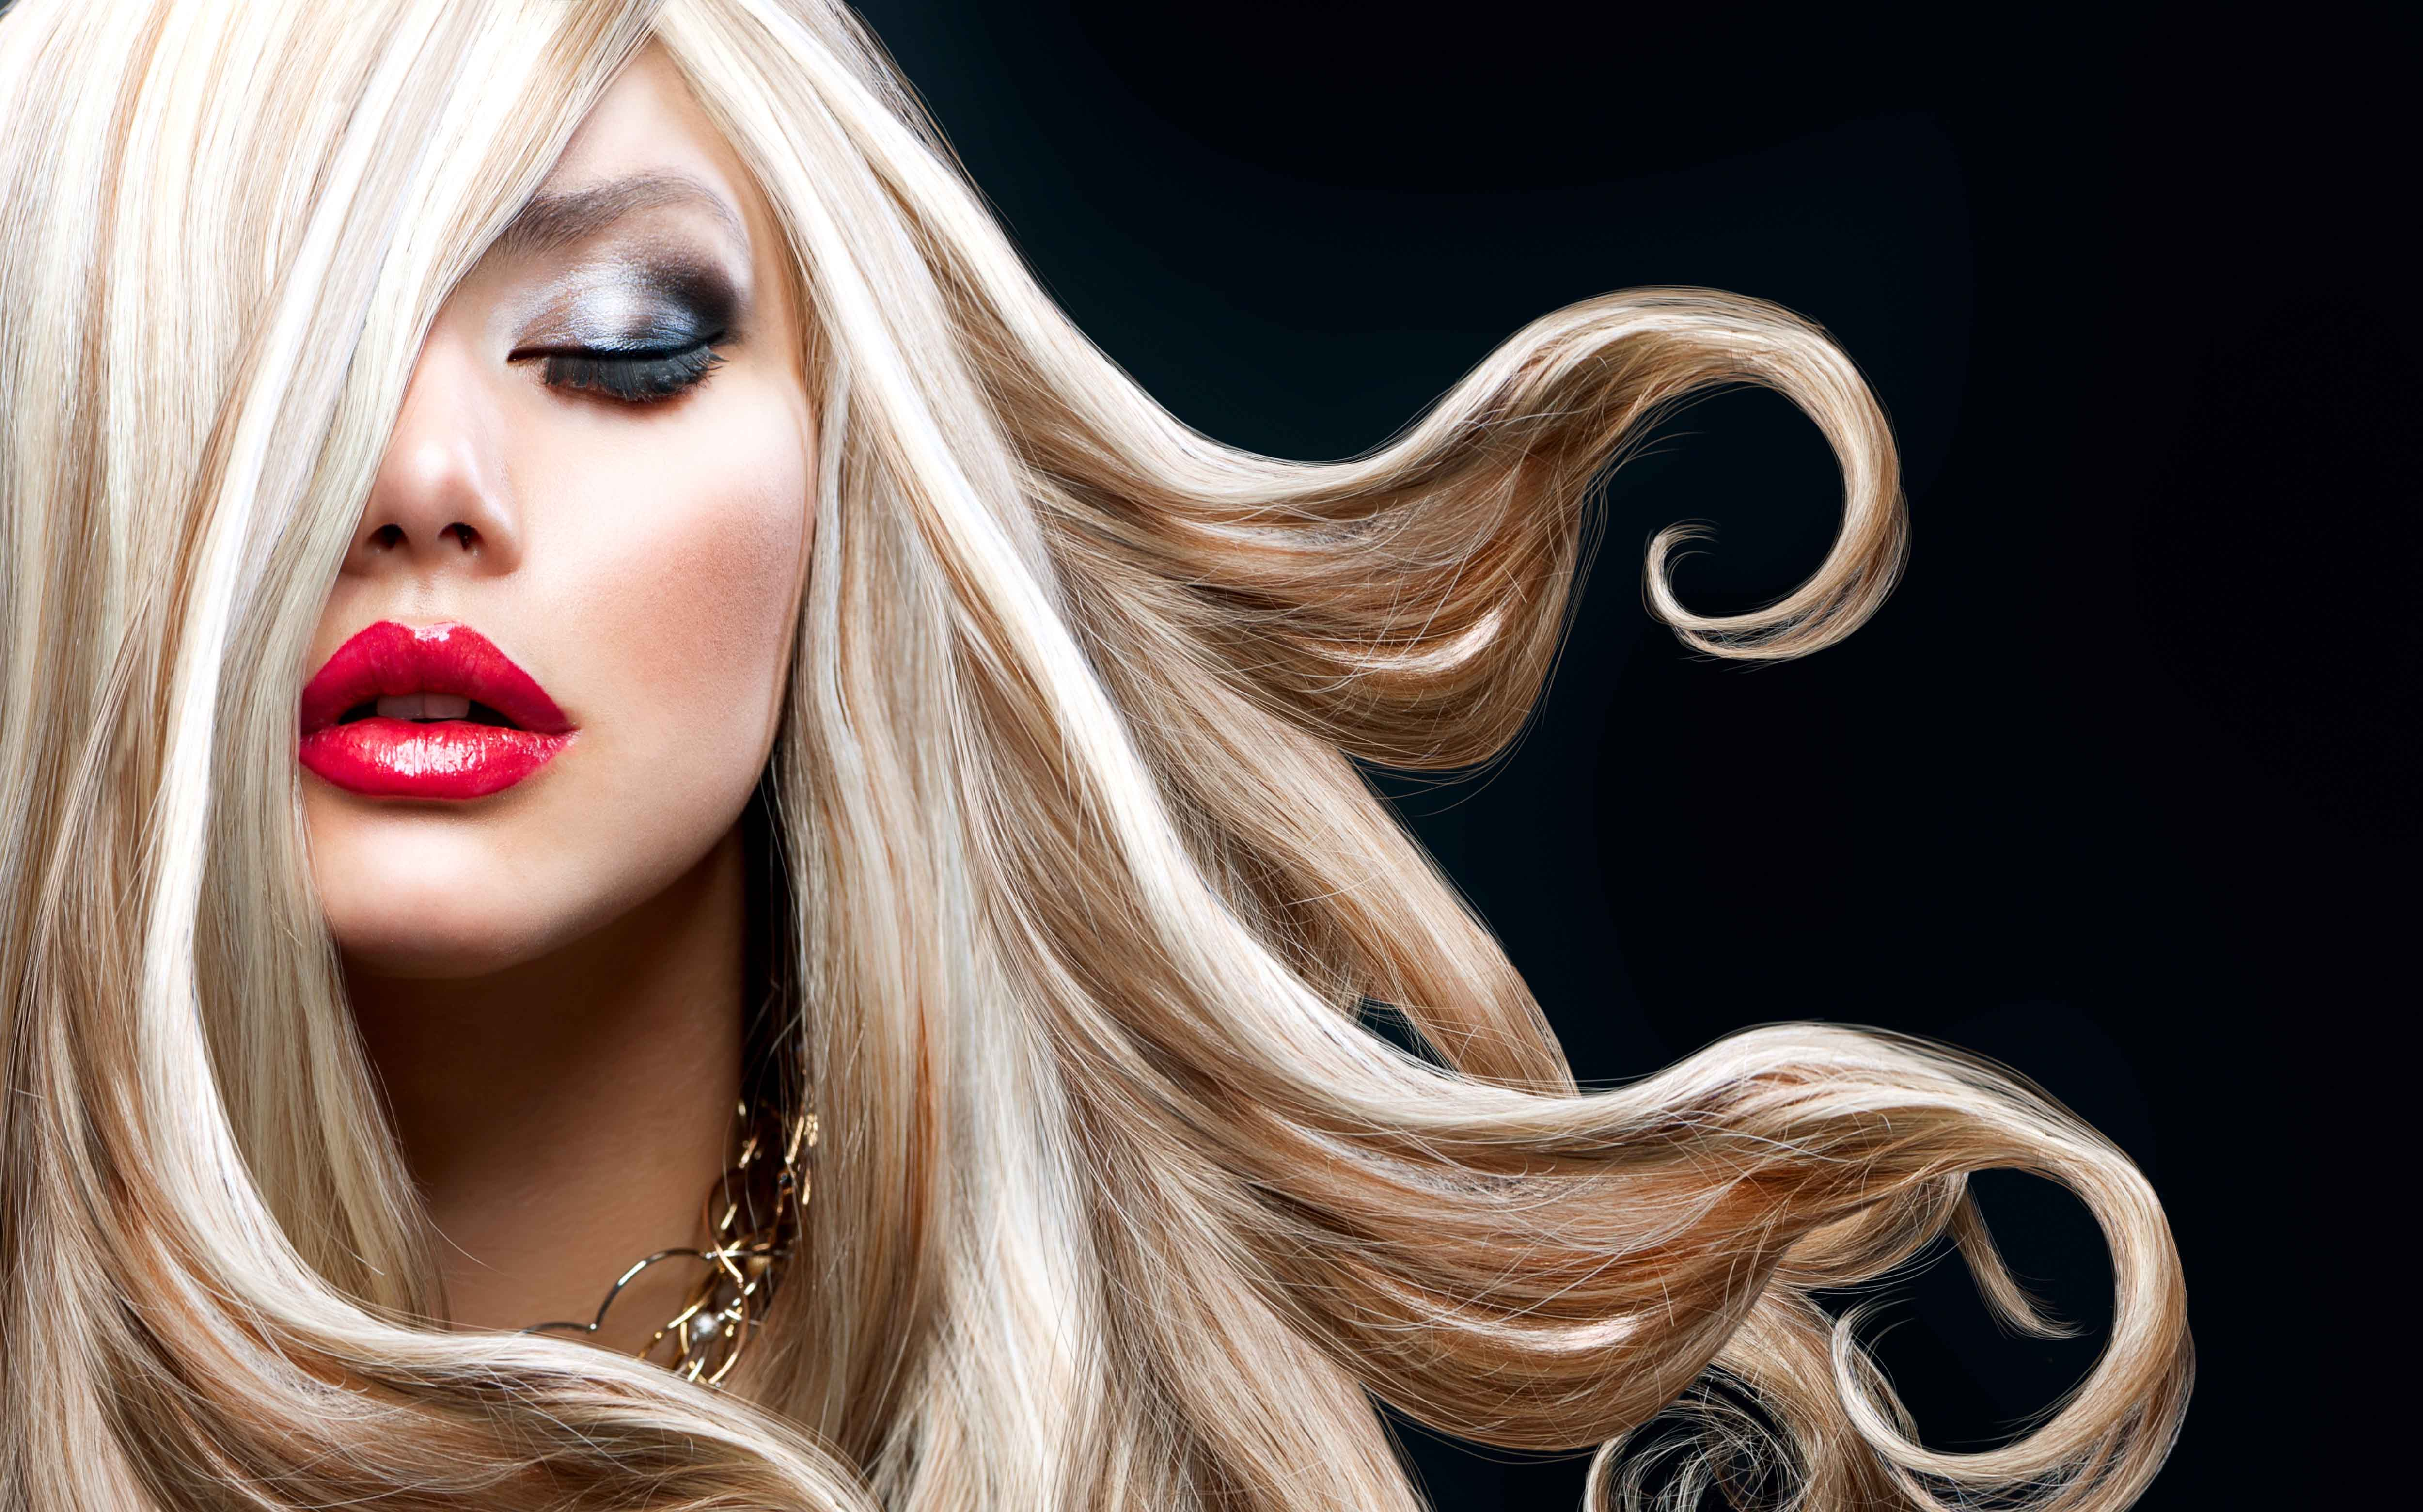 mushroom-blonde-zephir-parrucchieri-ascona-muralto.jpg